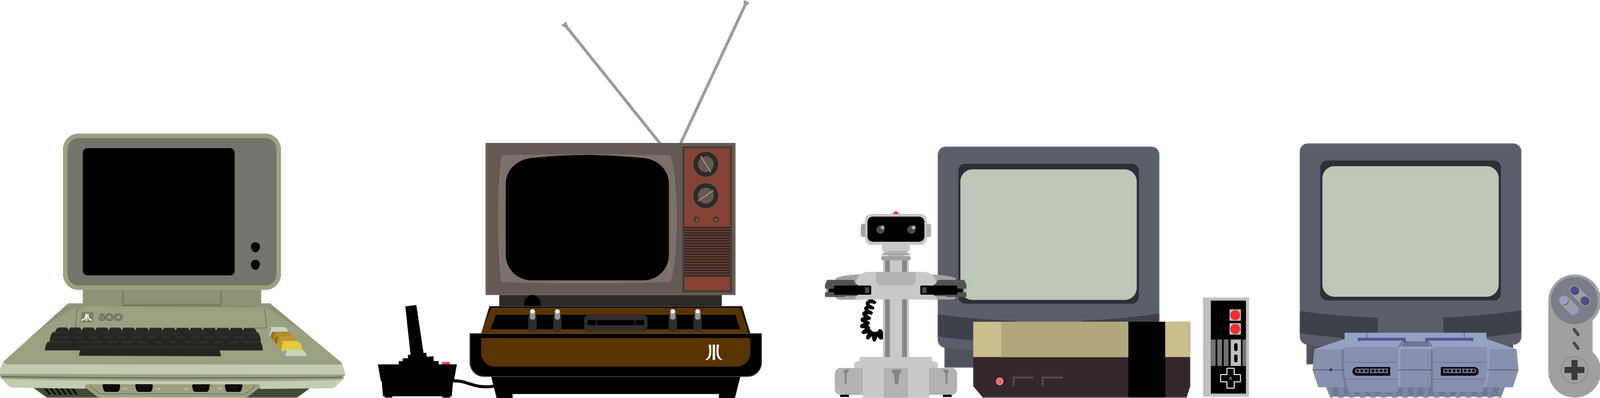 Retro Game Systems